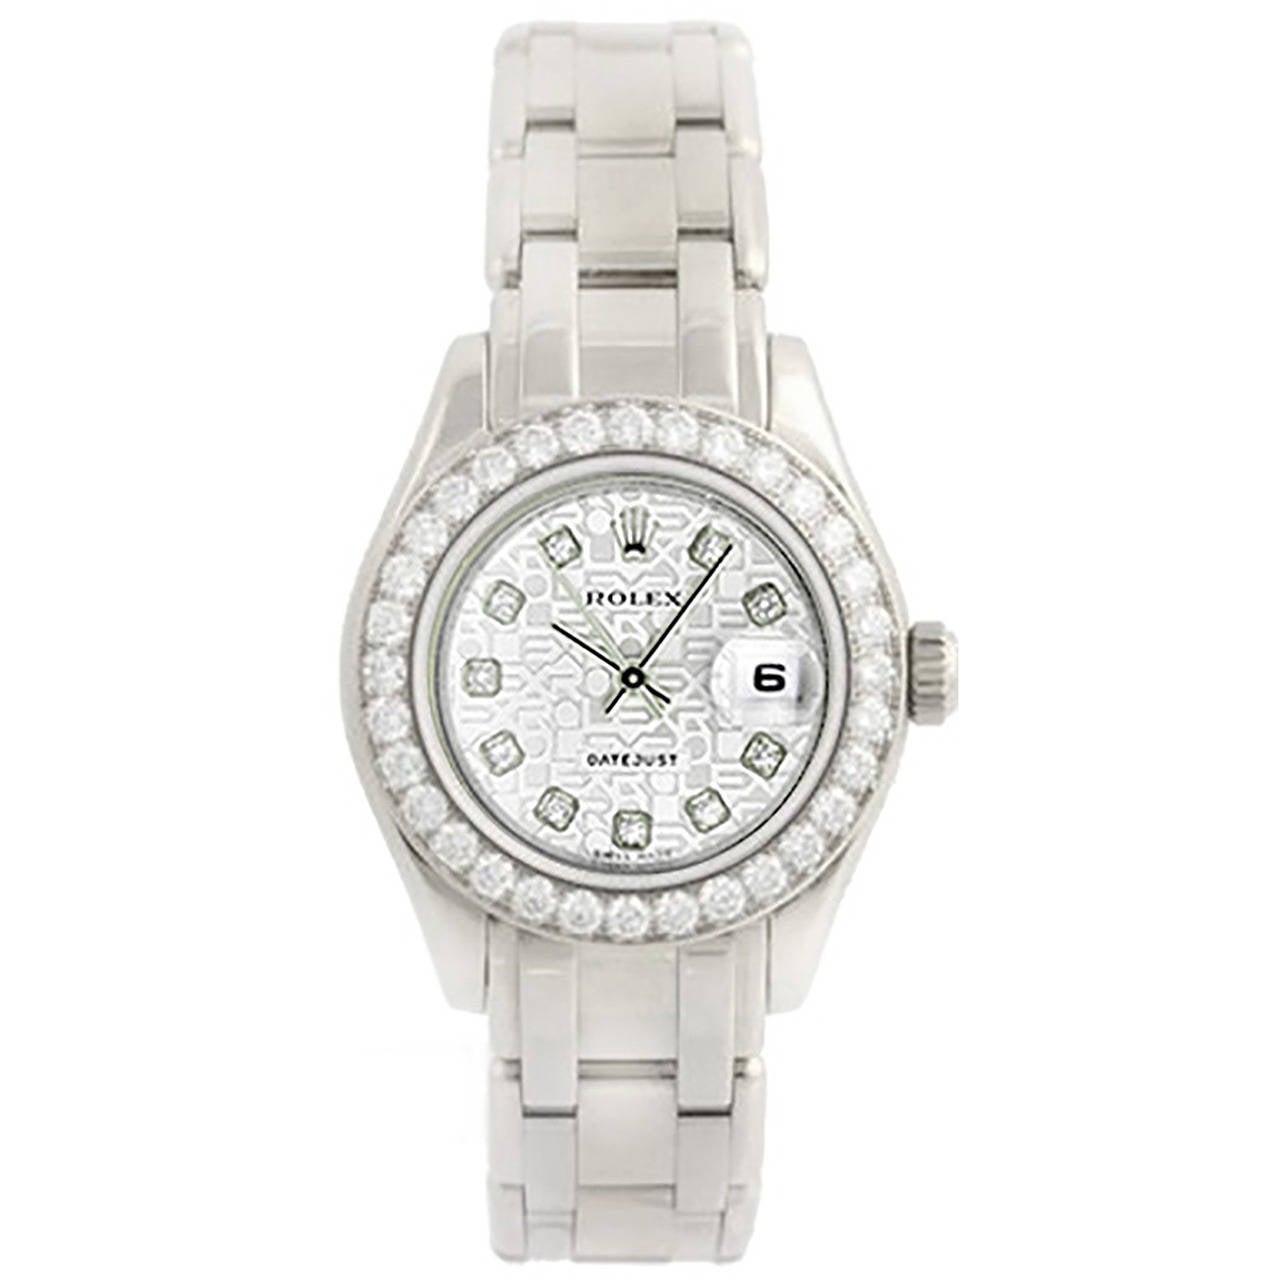 Rolex Lady's White Gold Diamond Pearlmaster Automatic Wristwatch Ref 80299